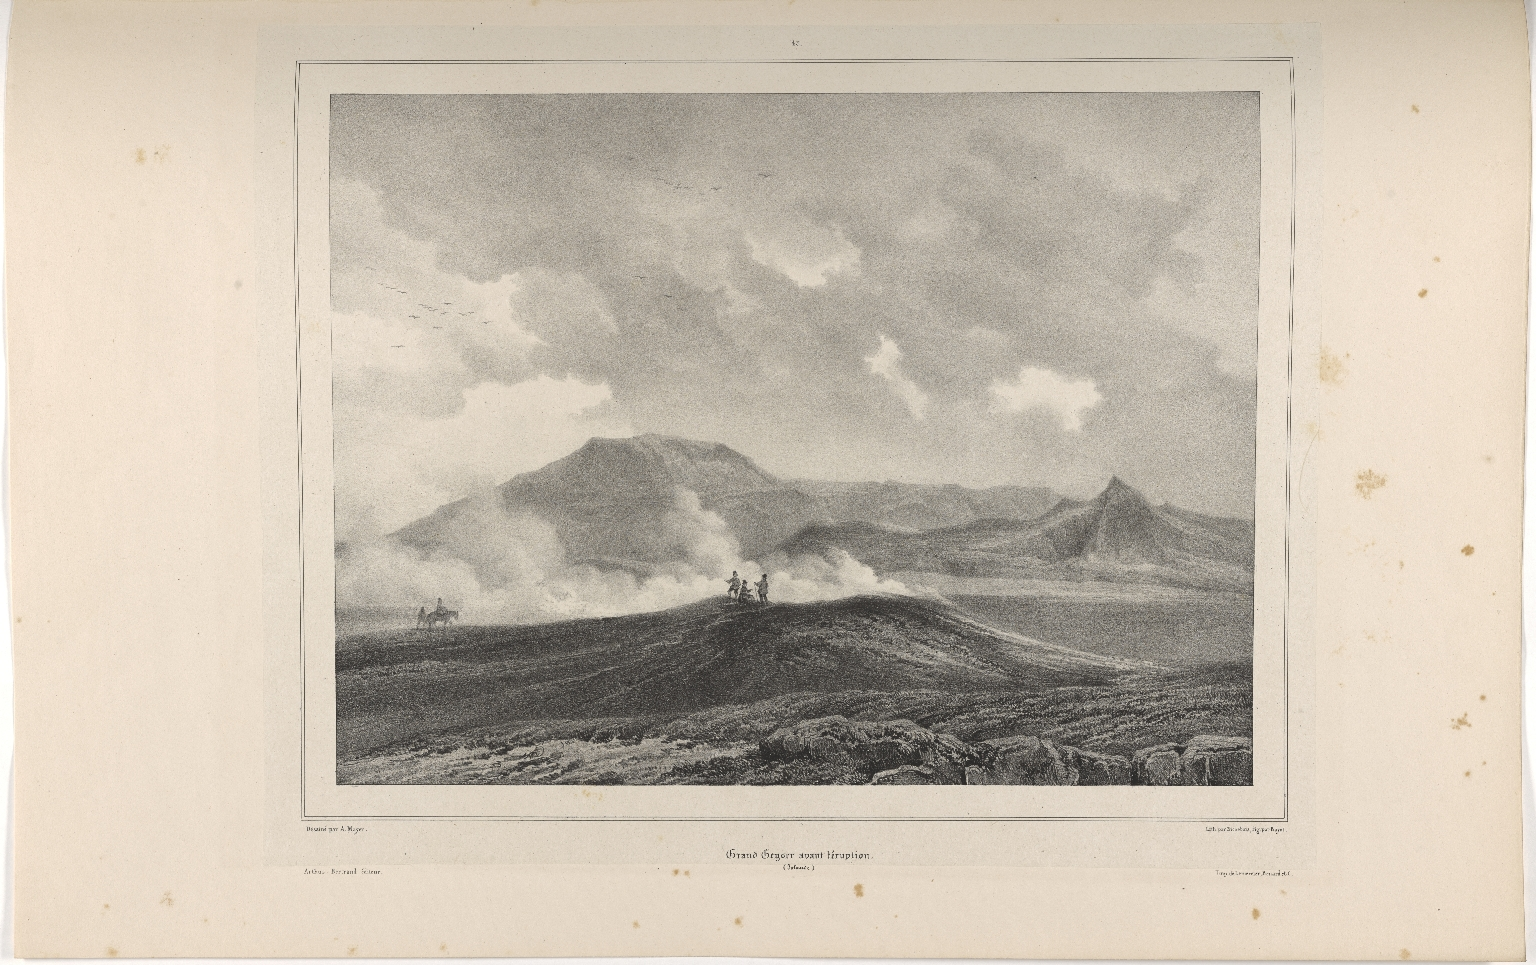 Grand Geysir avant l'éruption. (Islande.)